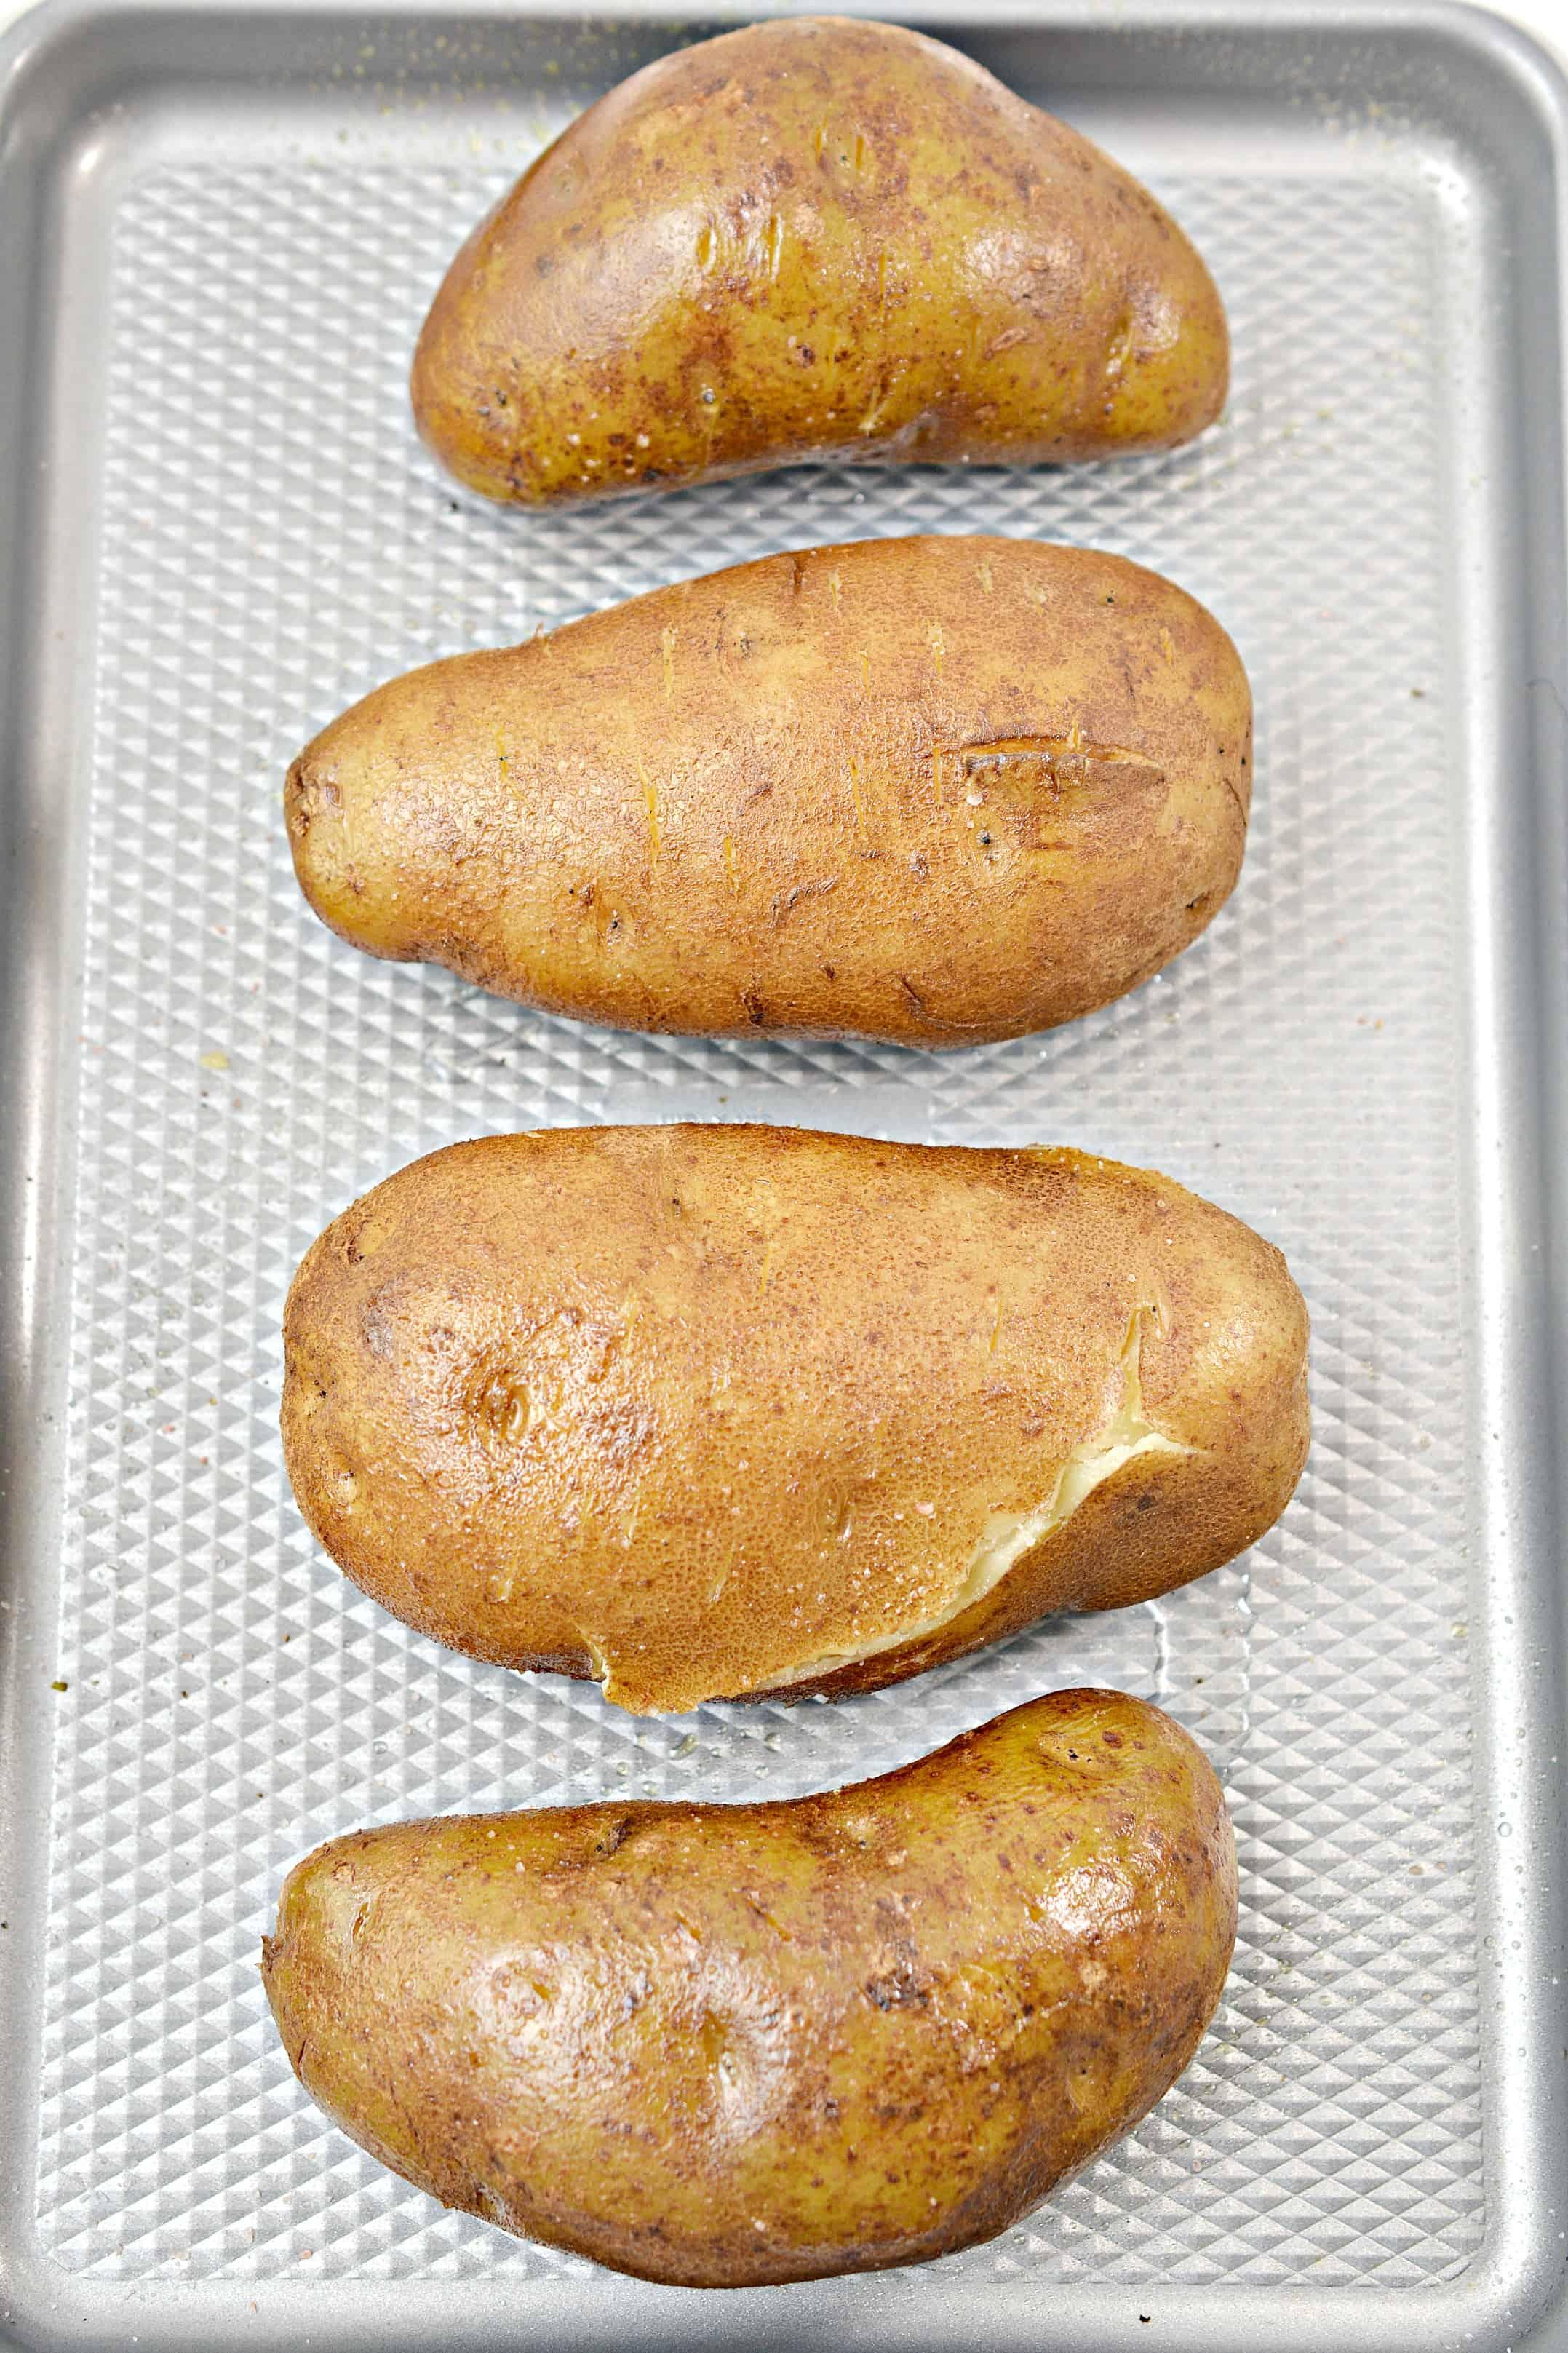 baked potatoes on a baking sheet